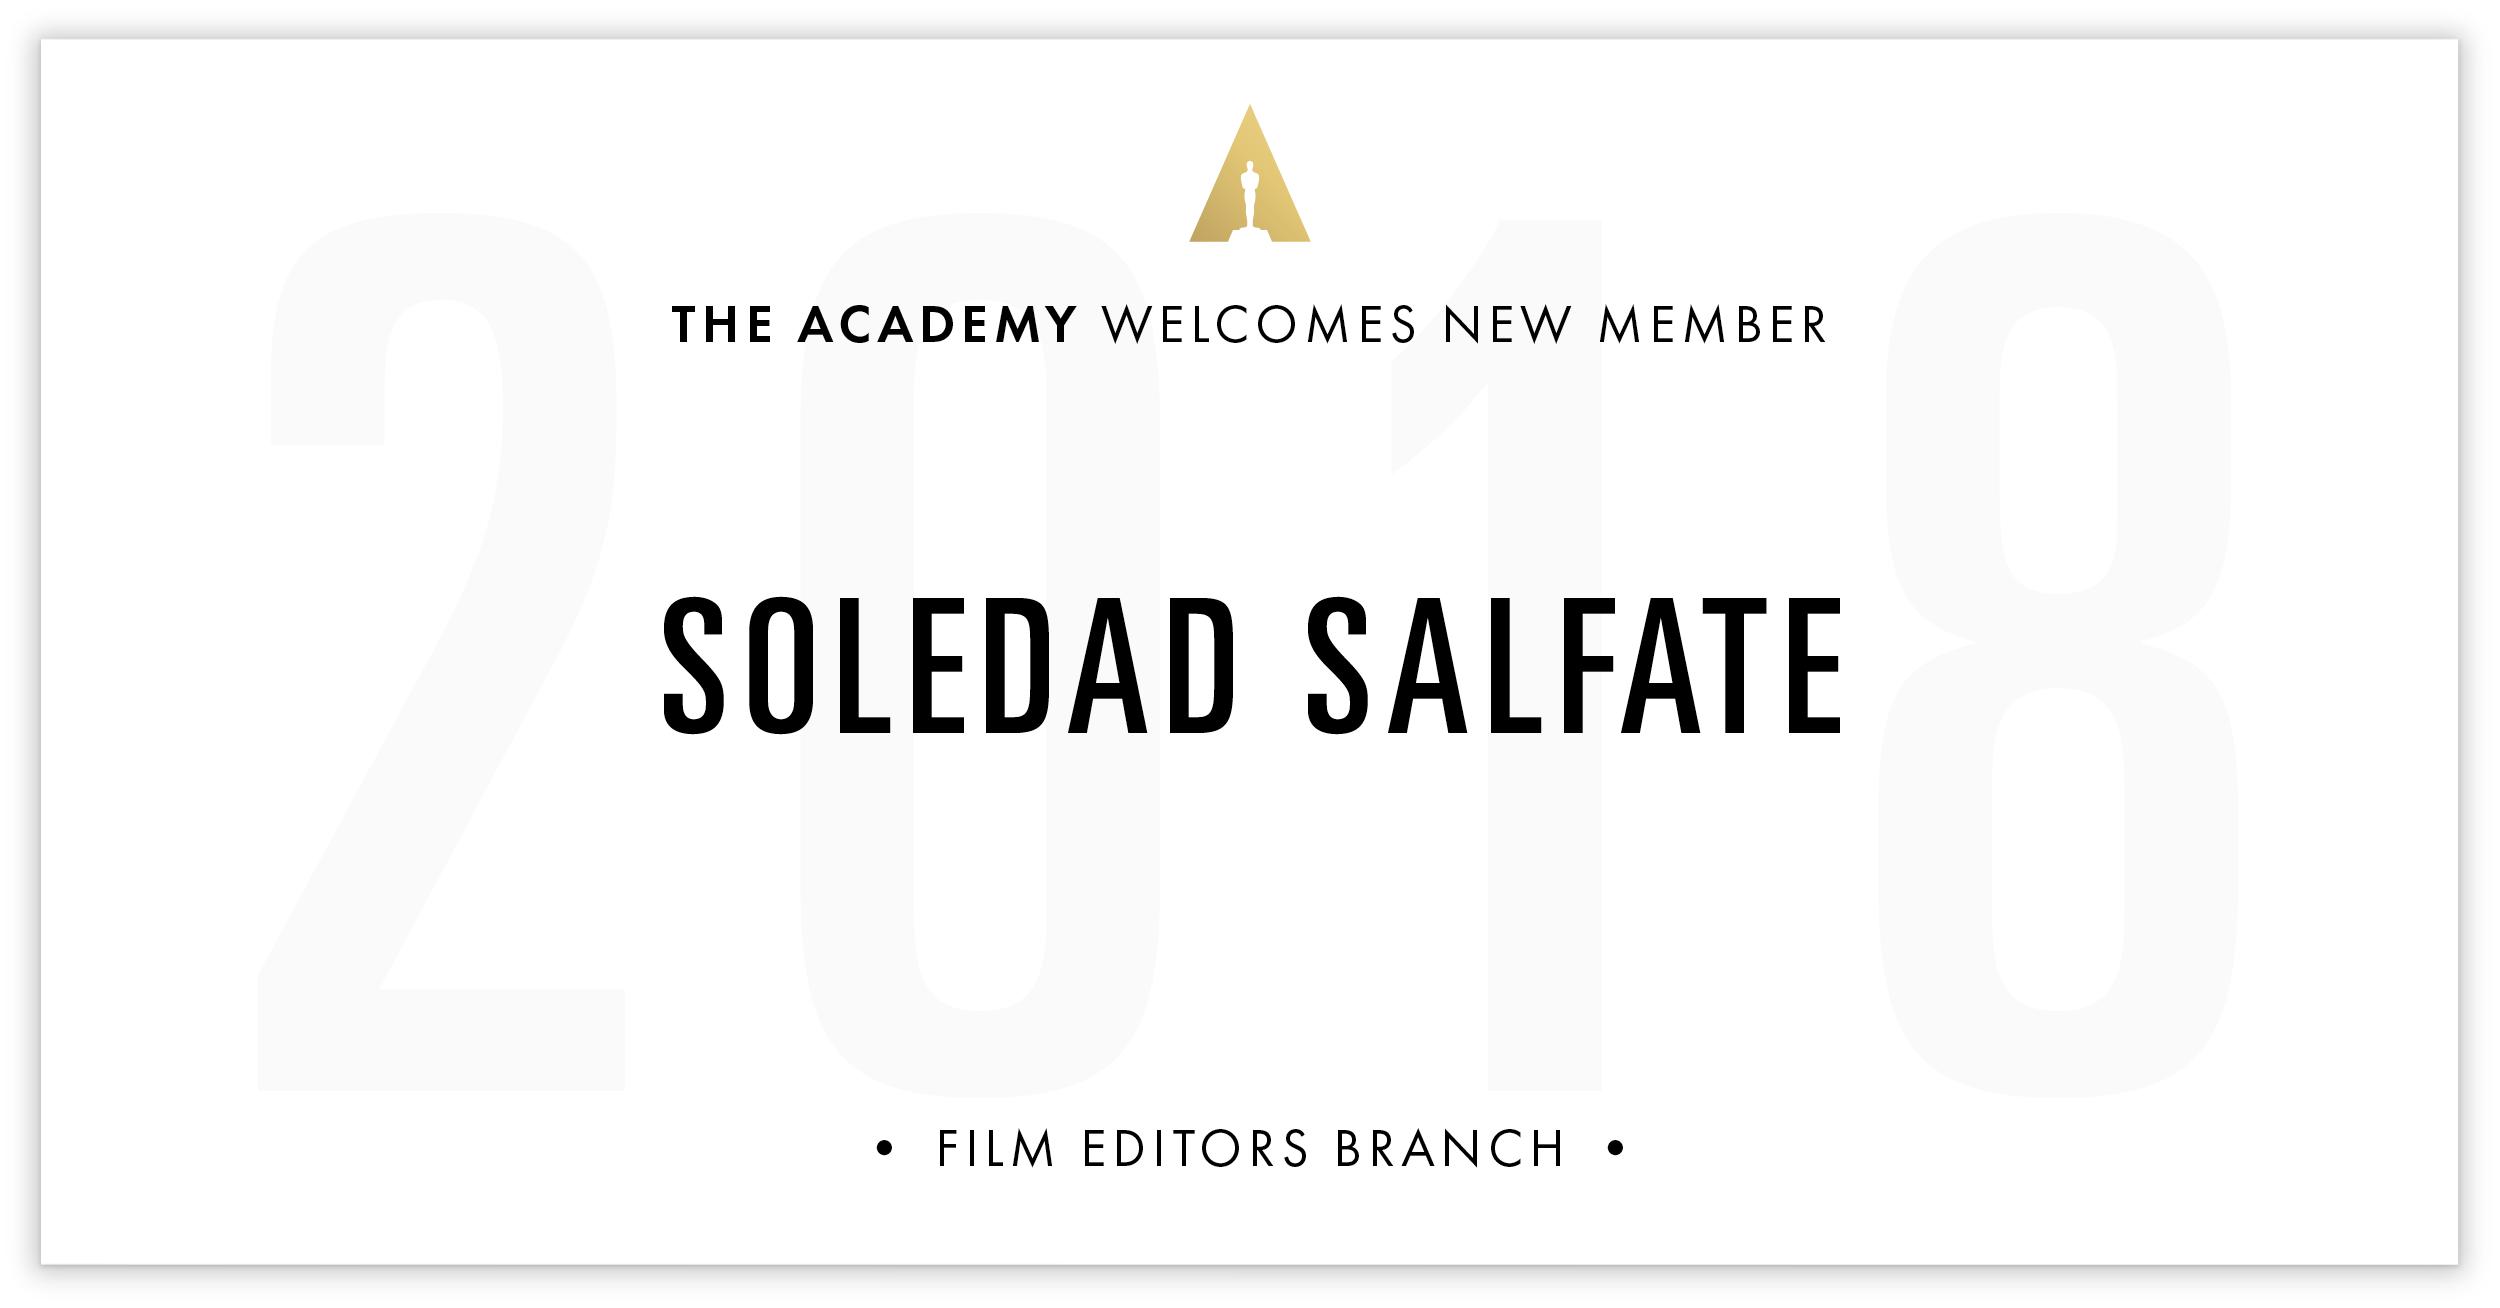 Soledad Salfate is invited!